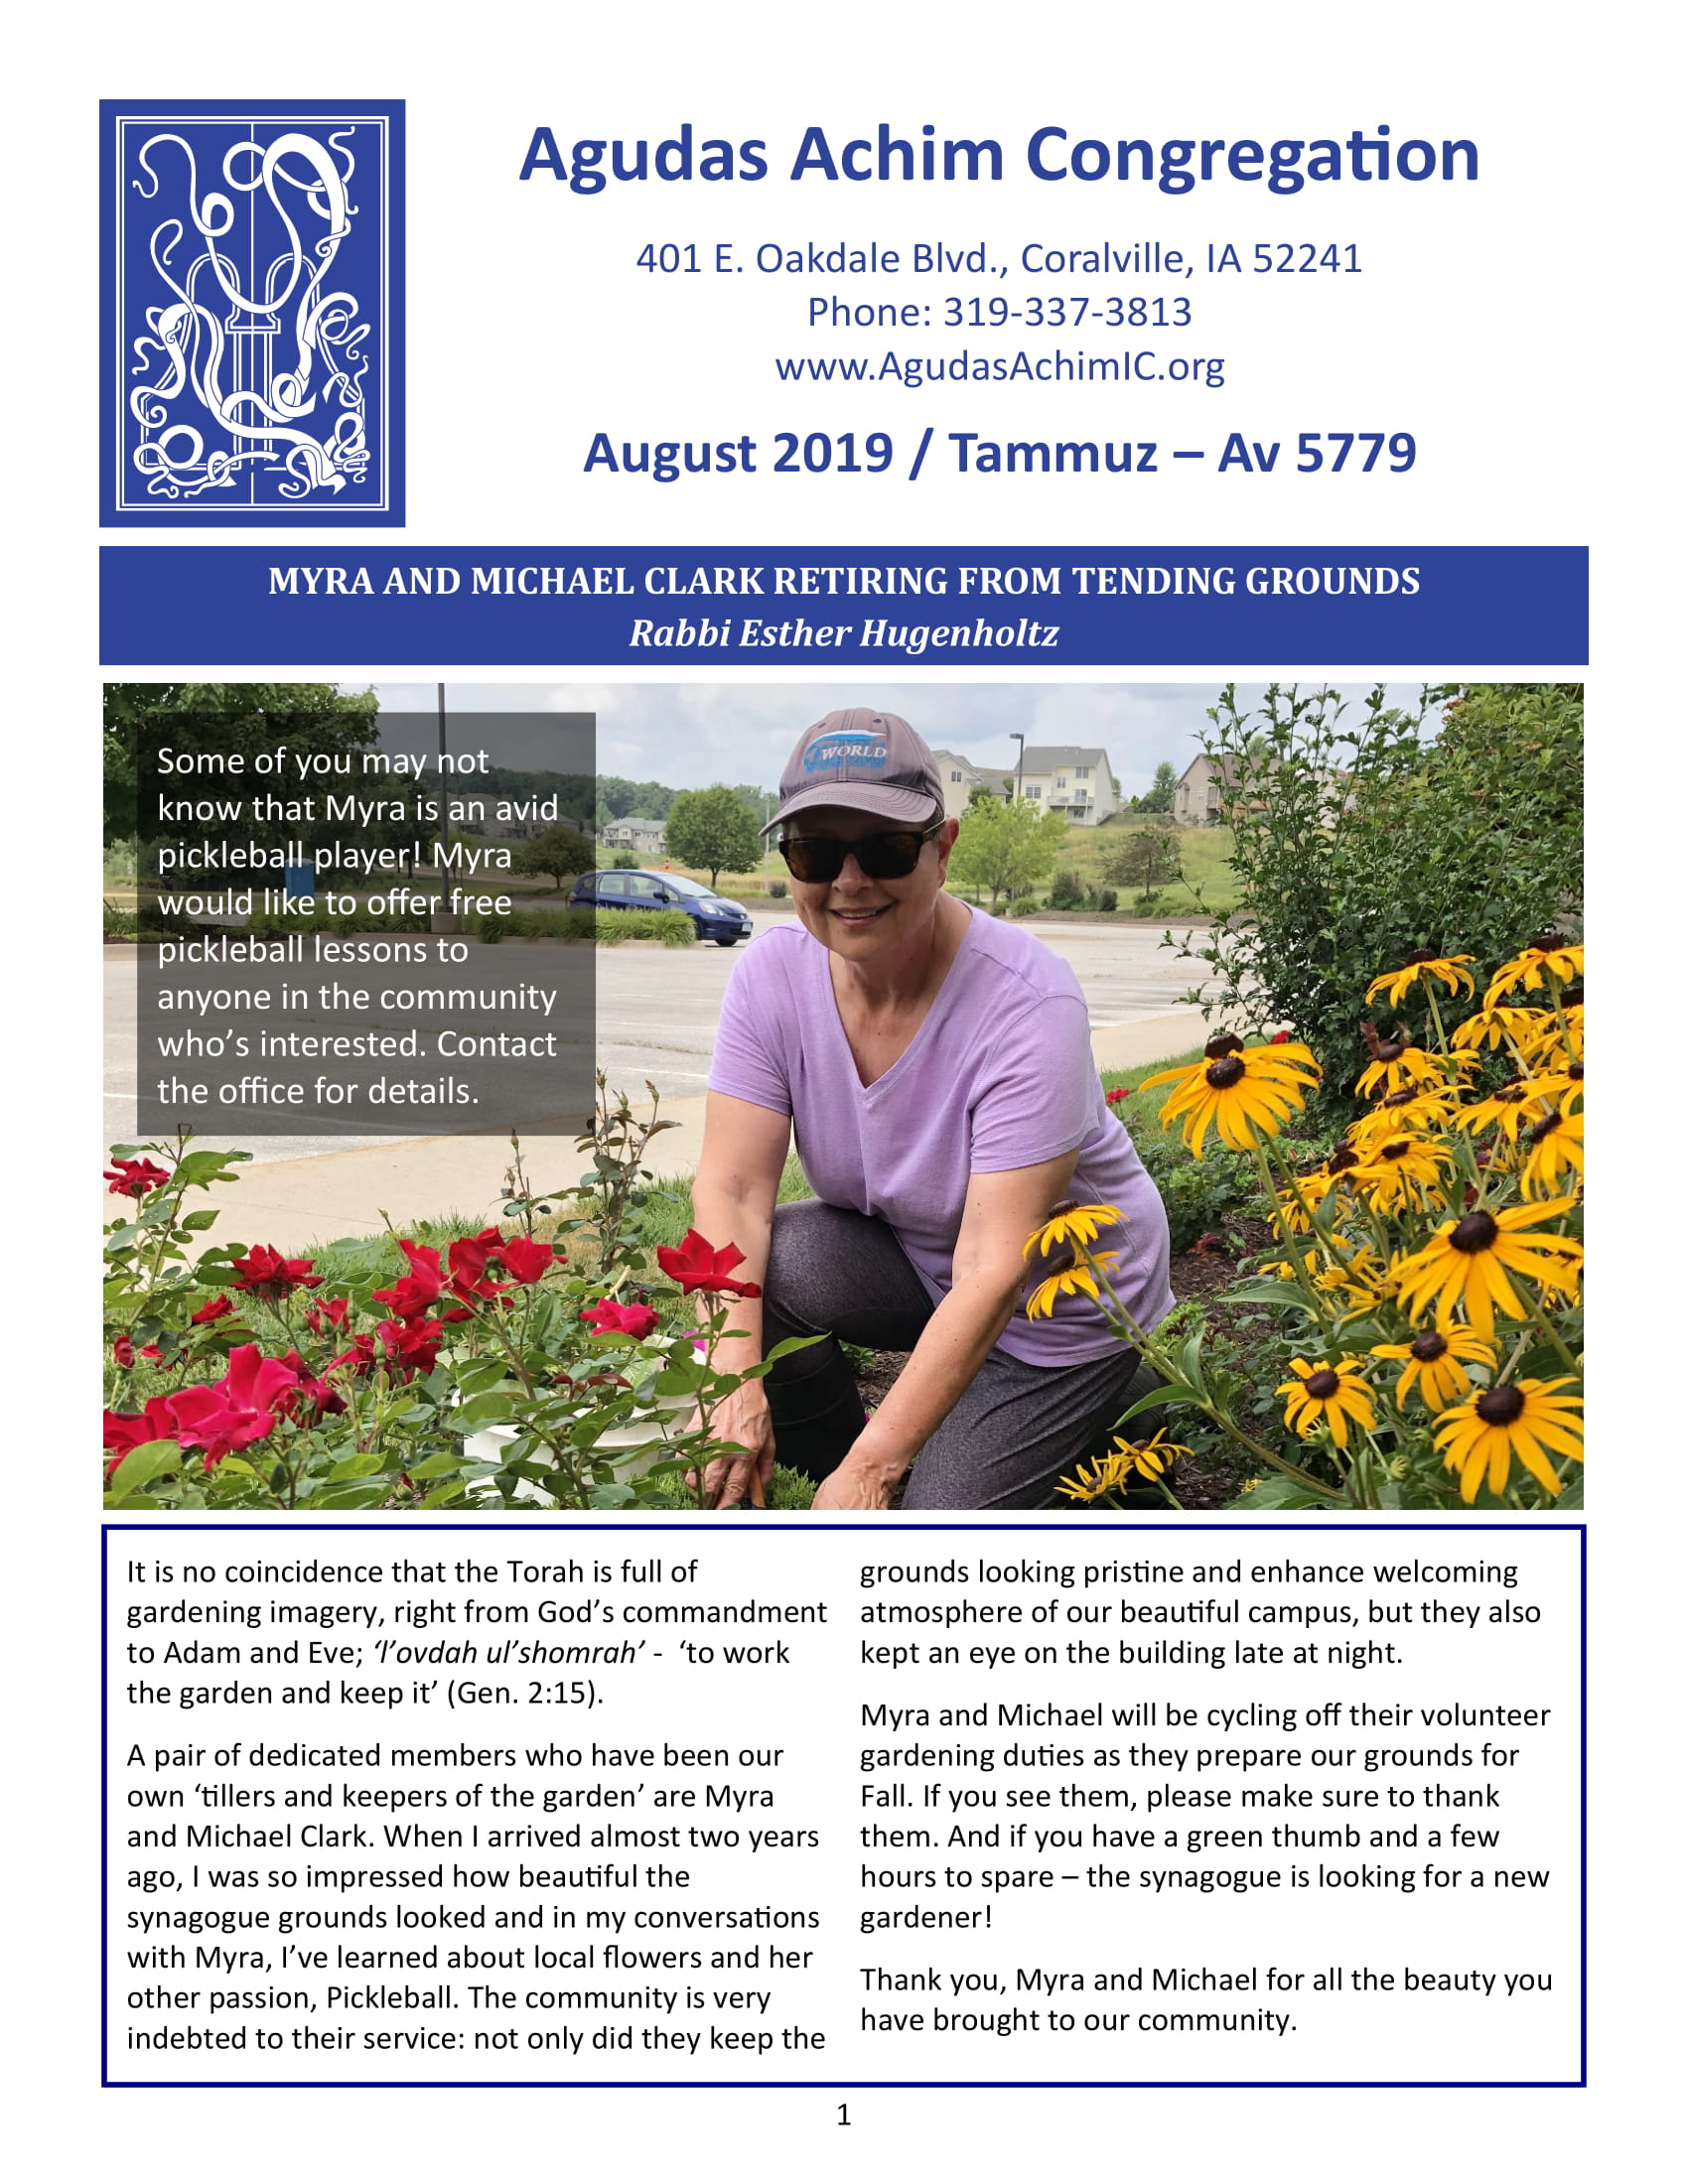 August 2019 Bulletin